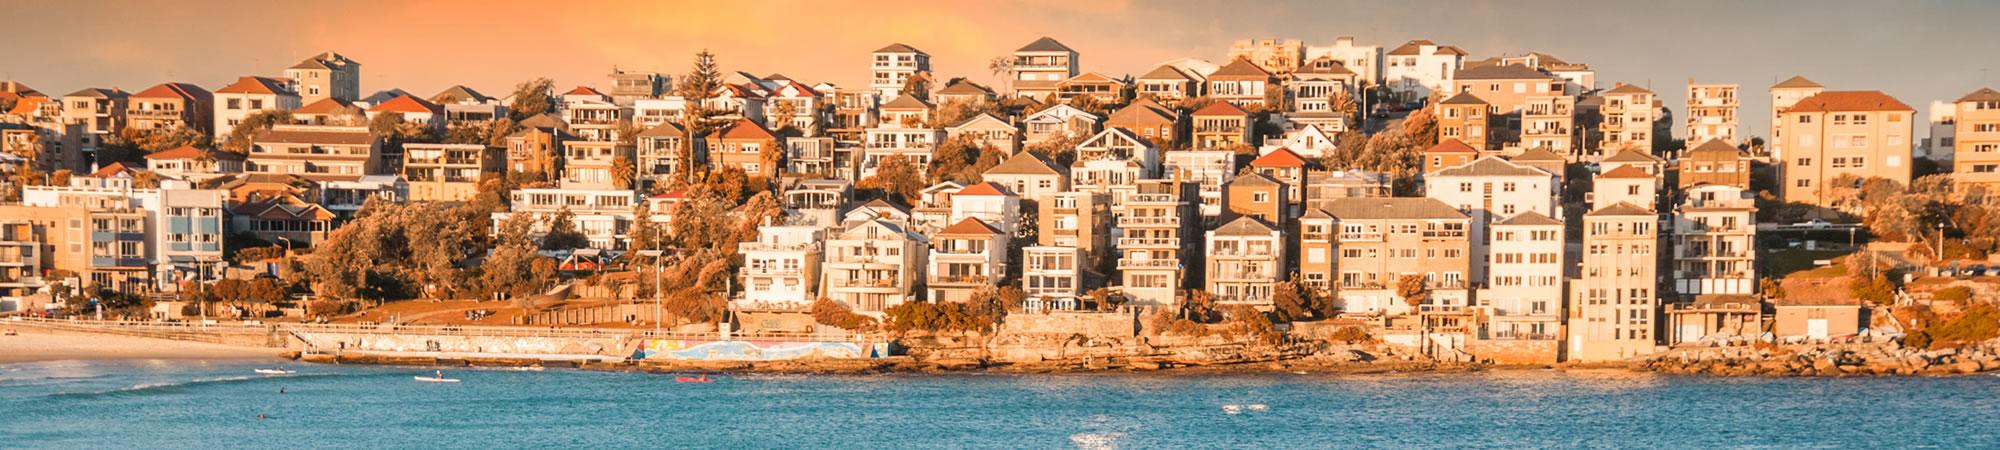 Eastern Sydney investment property